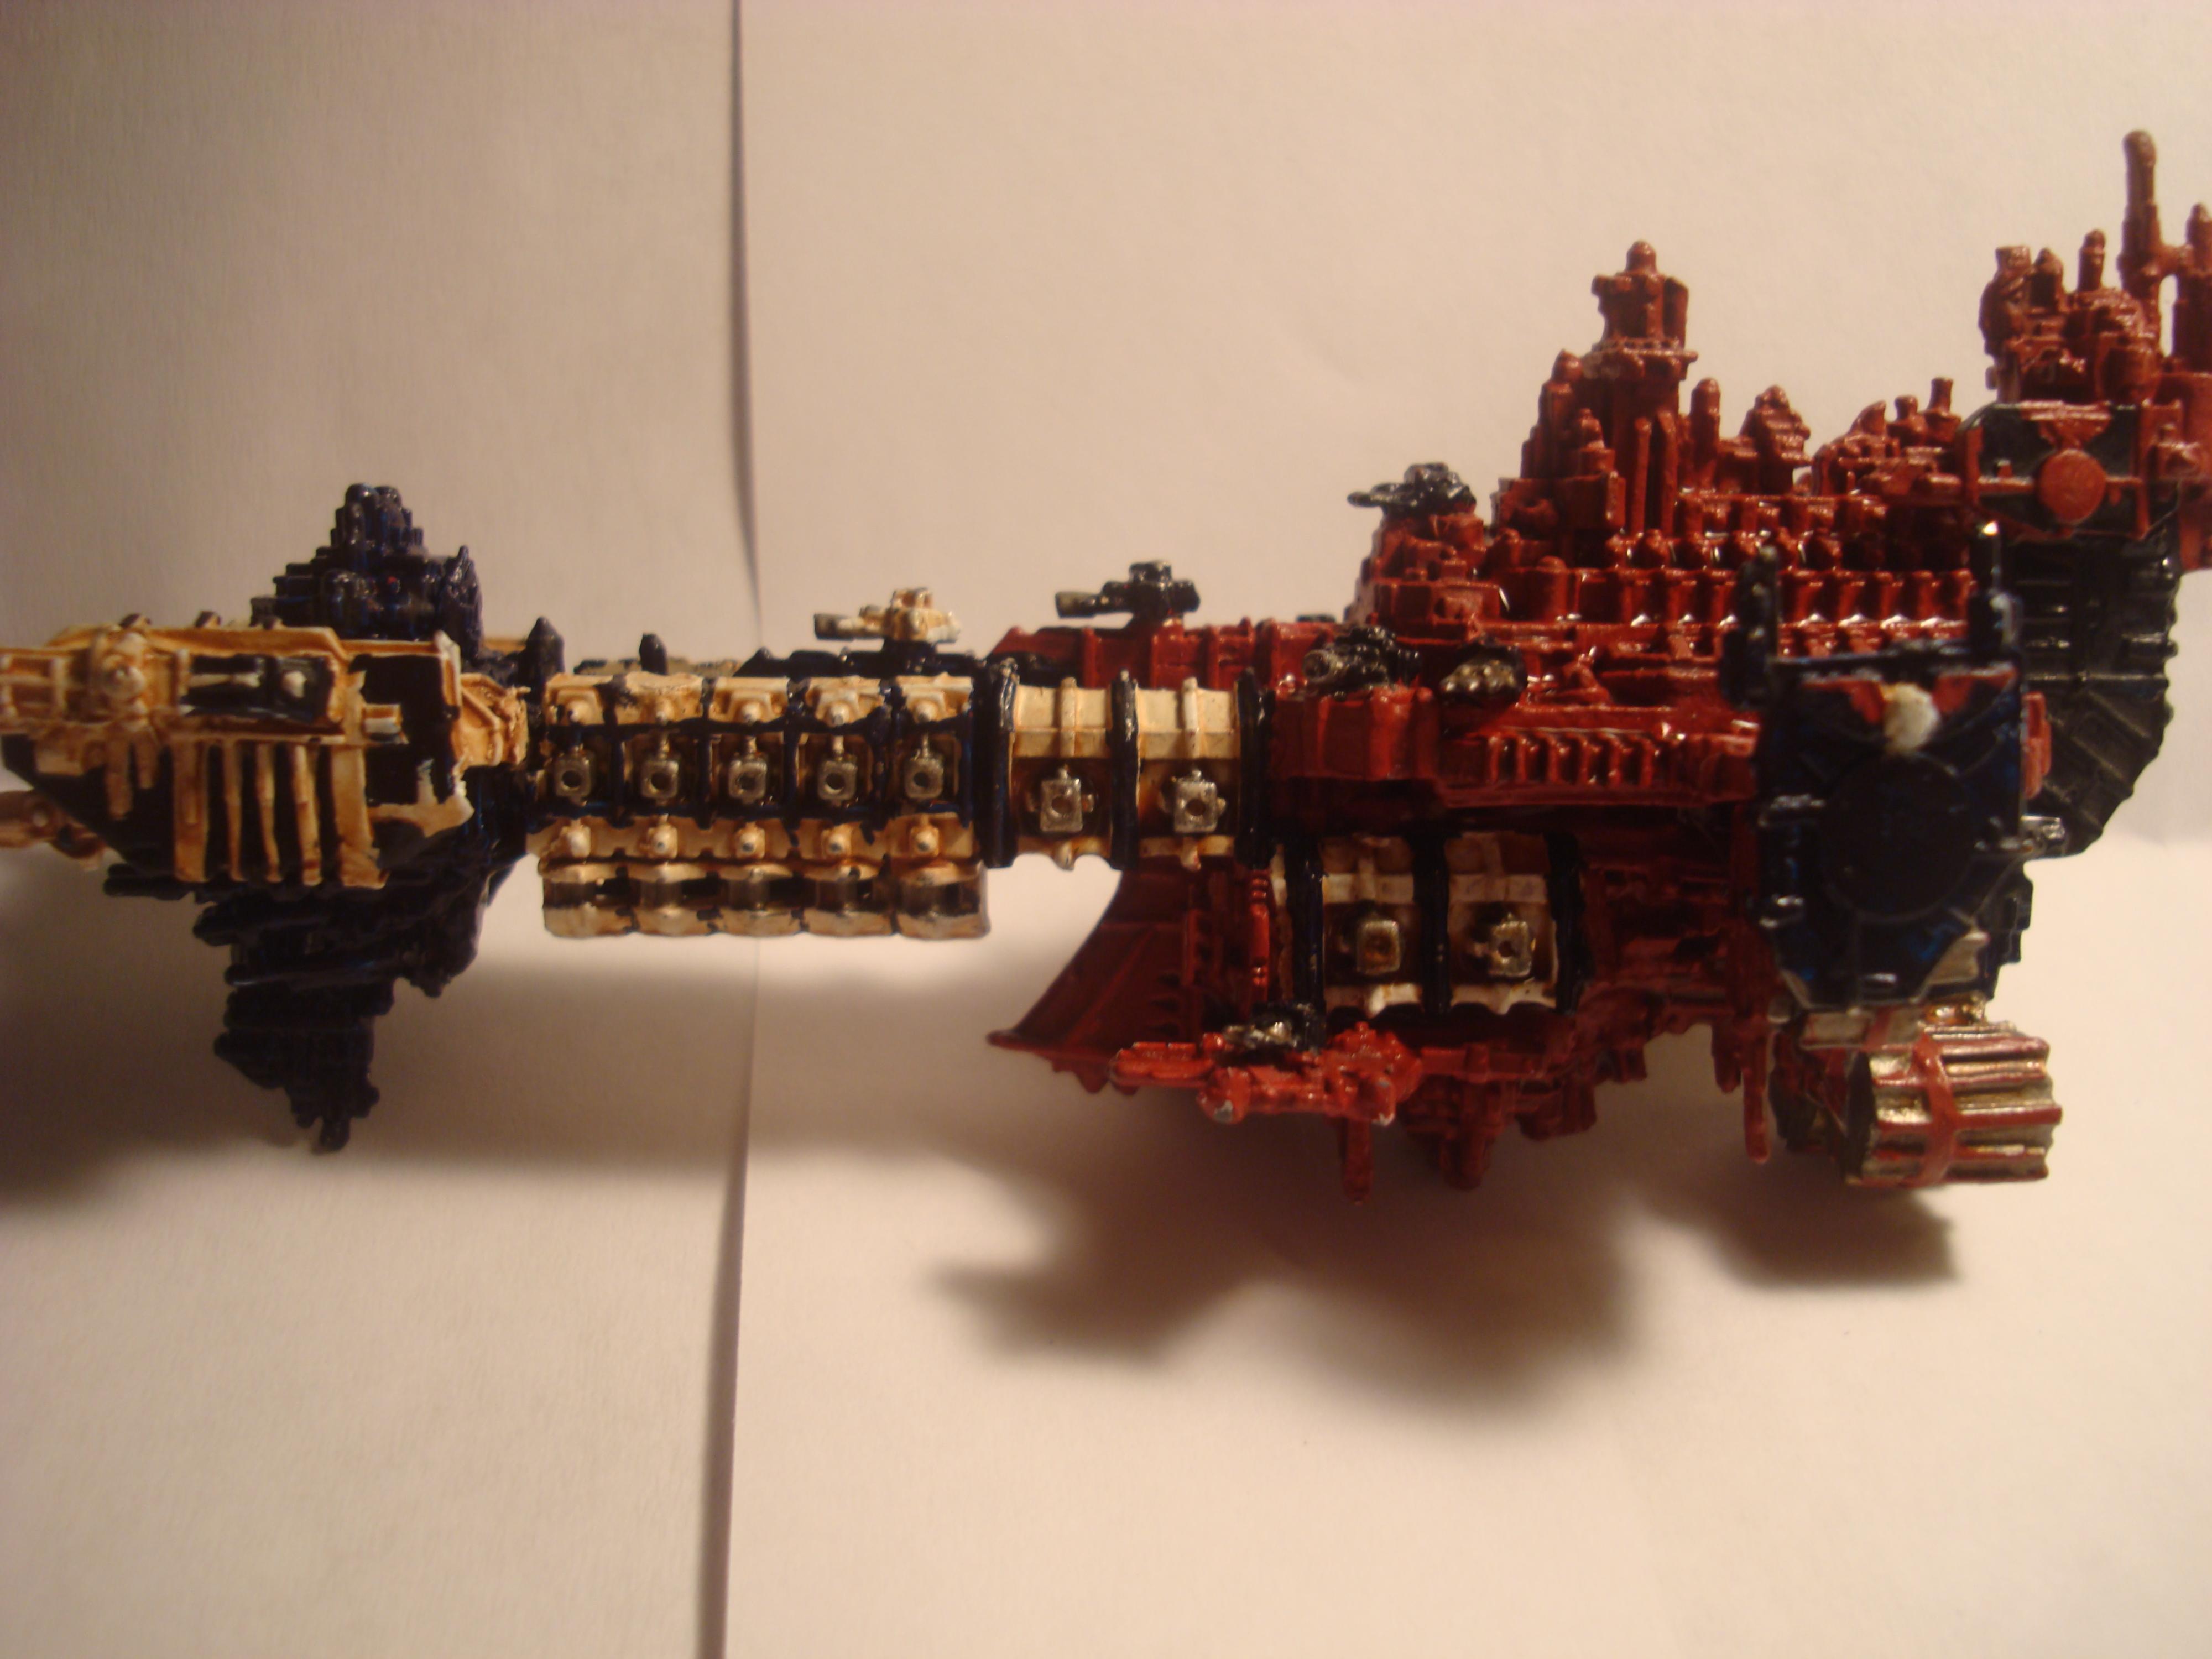 Battlefleet Gothic, Battlebarge Havana (Unfinished Flagship)